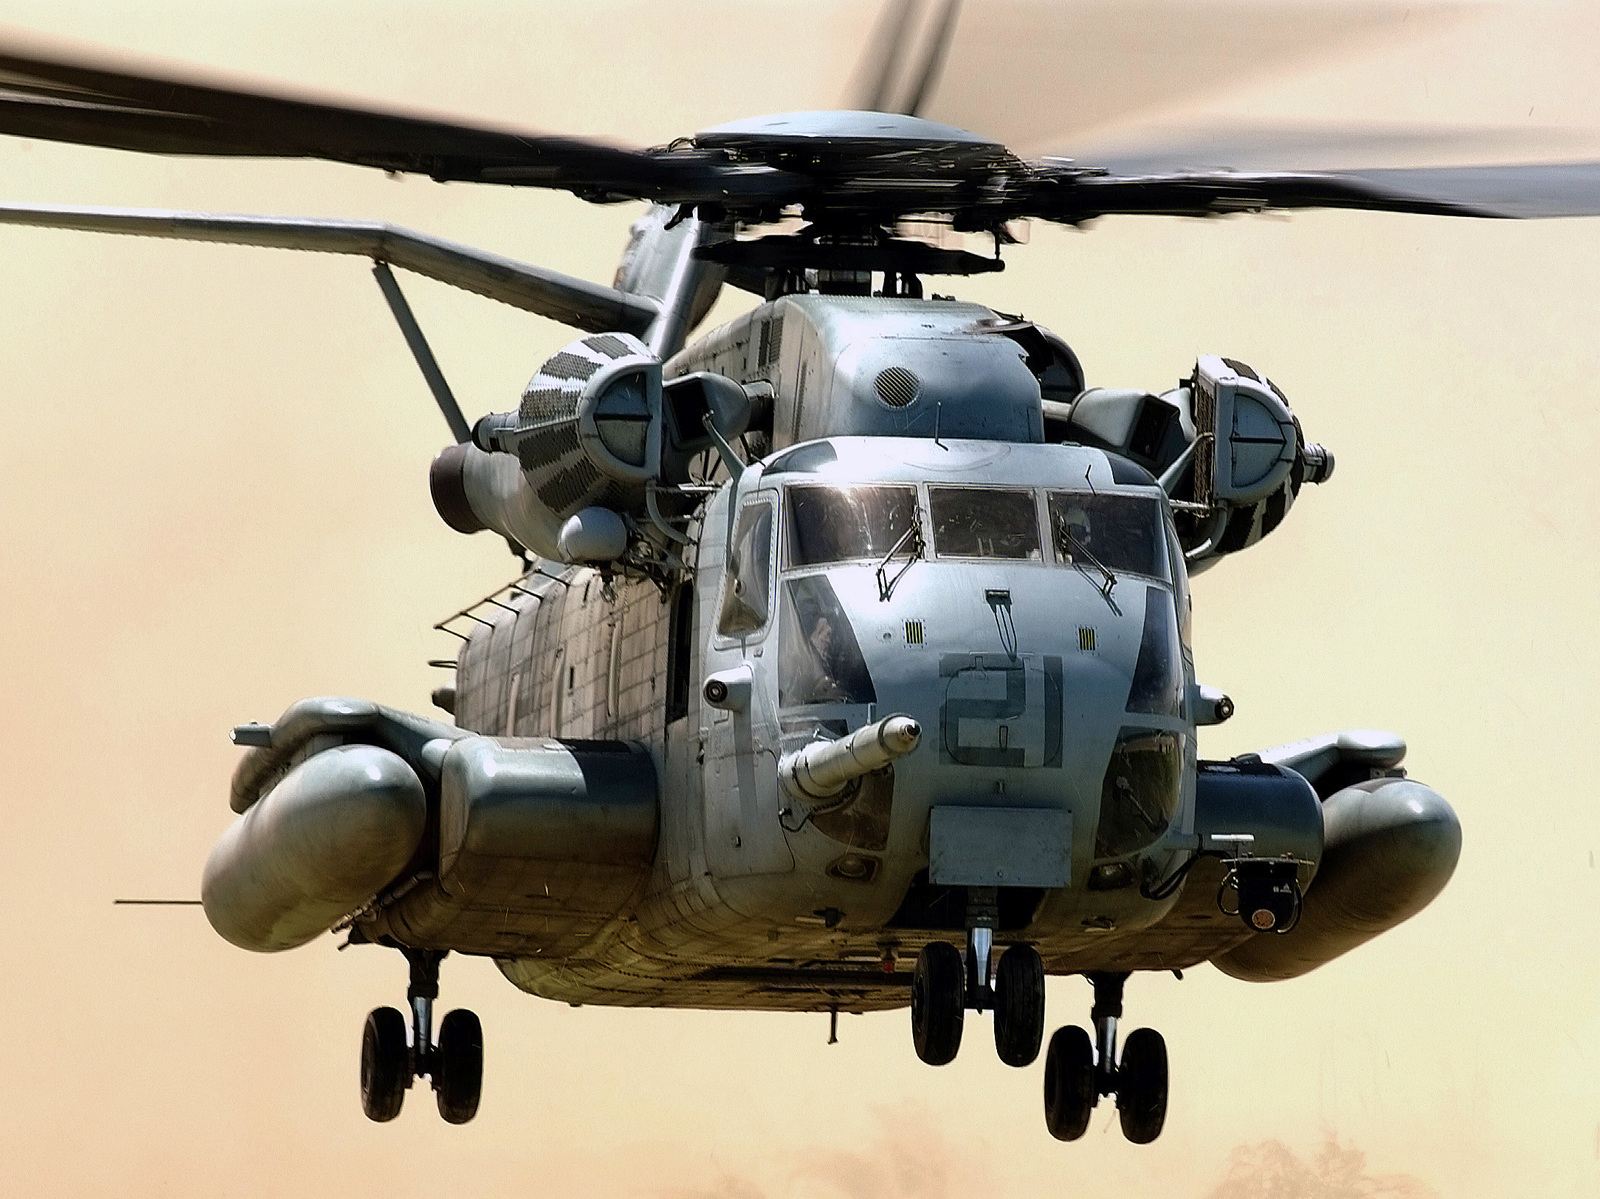 A US Marine Corps (USMC) CH-53E Sea Stallion helicopter assigned to